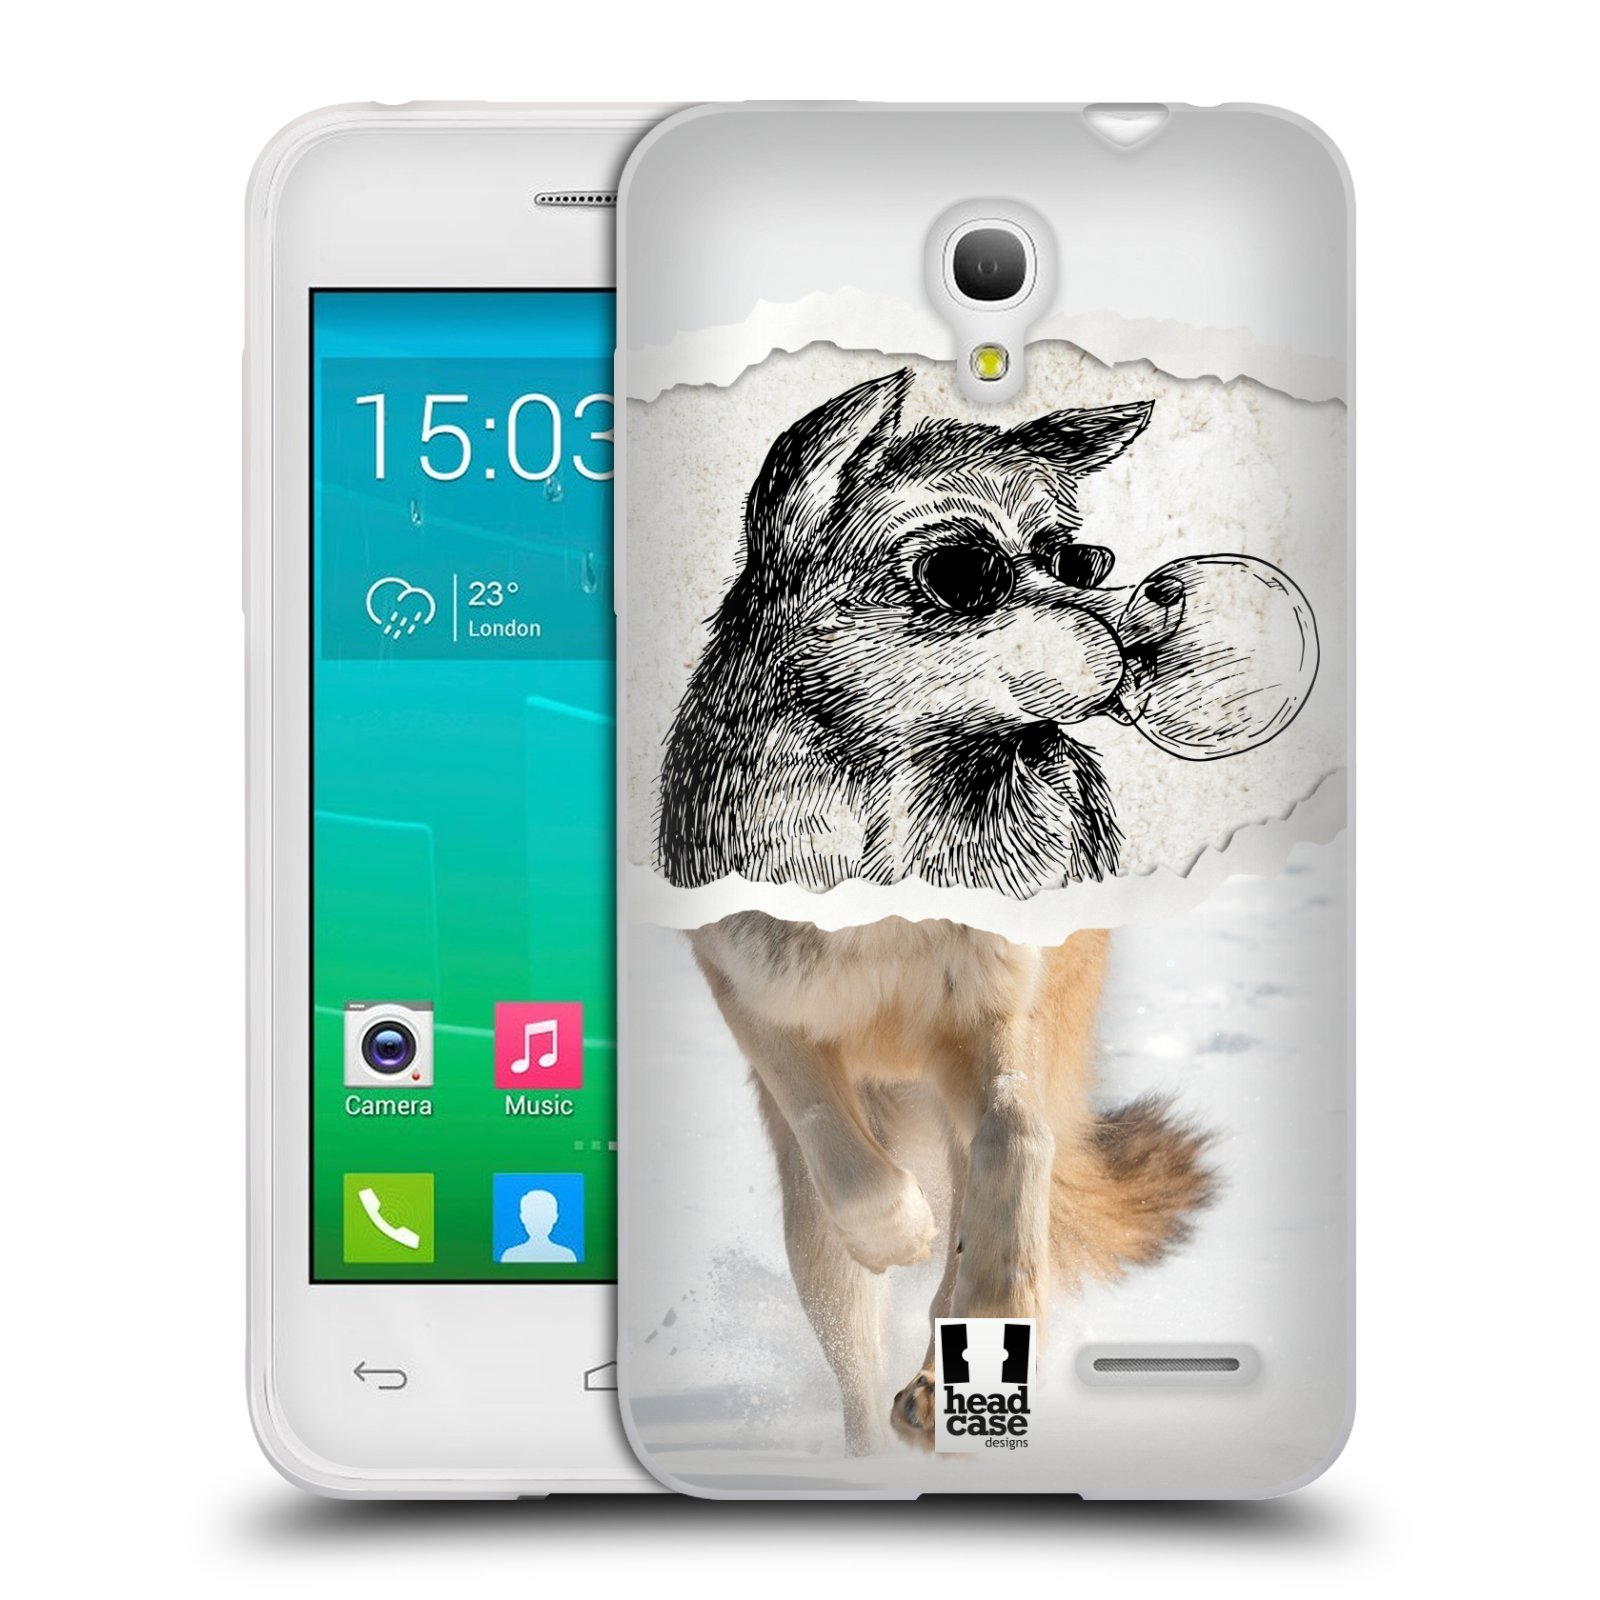 HEAD CASE silikonový obal na mobil Alcatel POP S3 OT-5050Y vzor zvířata koláž vlk pohodář